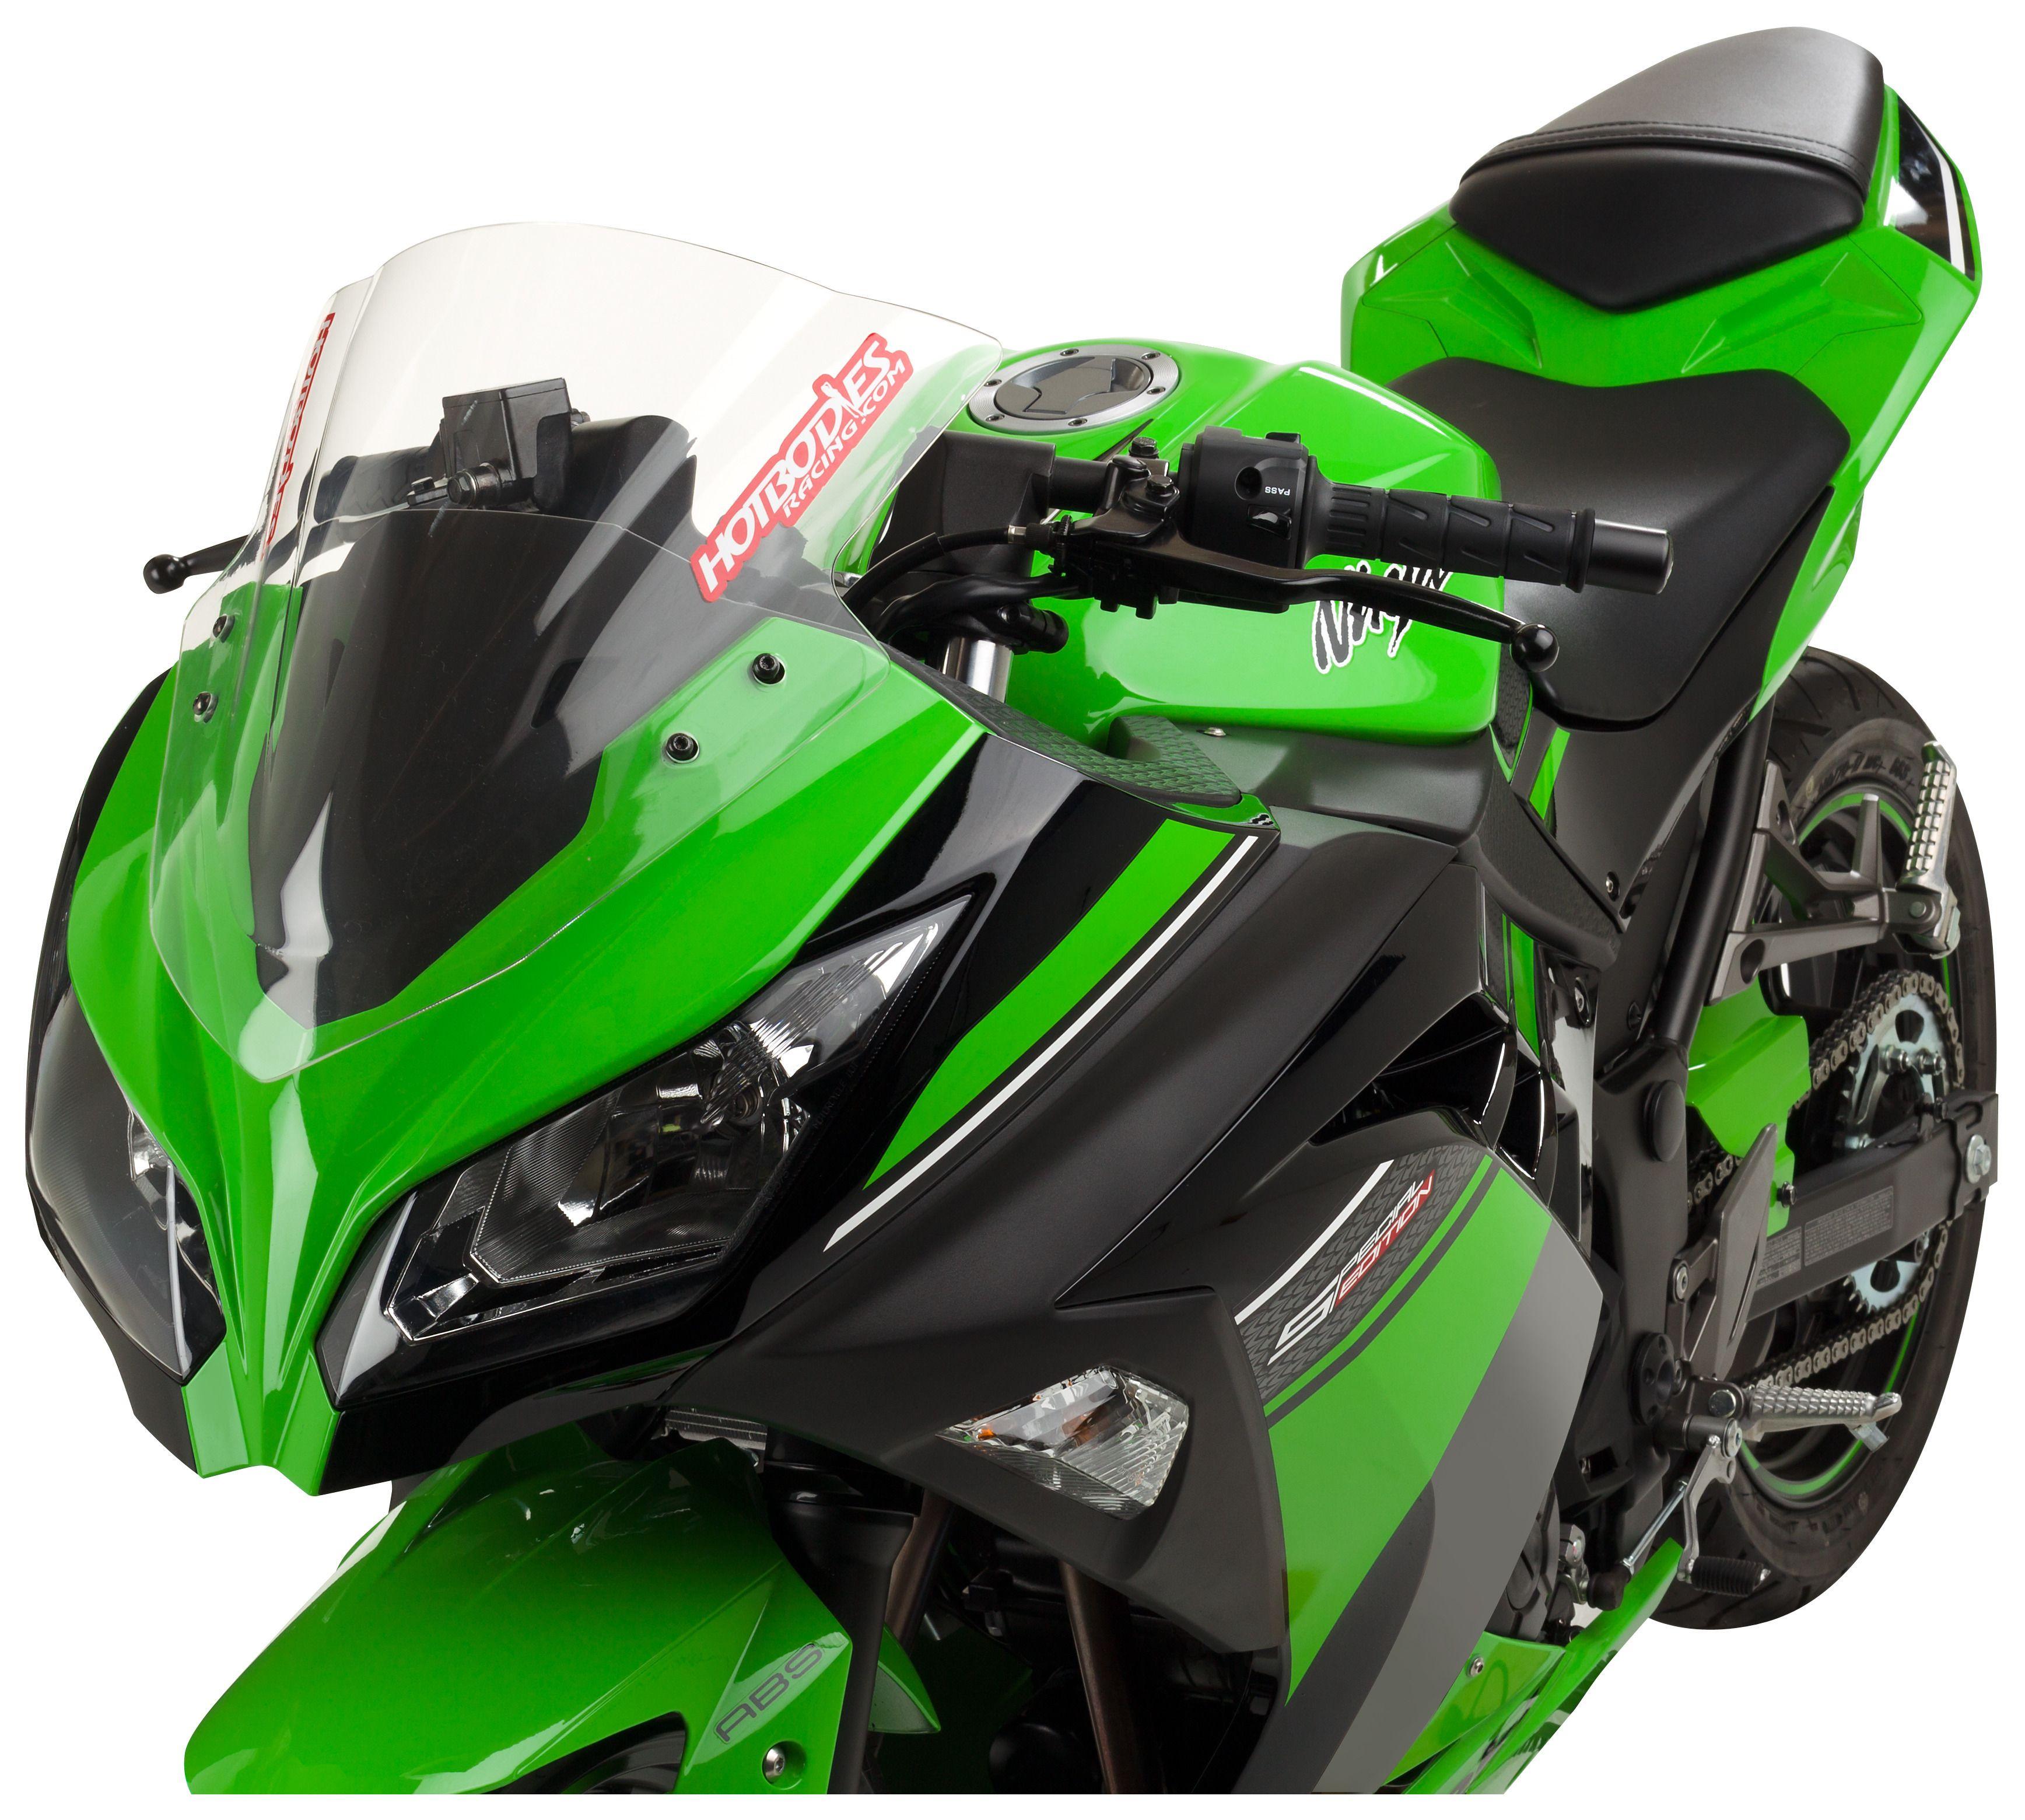 Hotbos GP Windscreen Kawasaki Ninja 300 2013-2017 | 10% ($8.20 ...